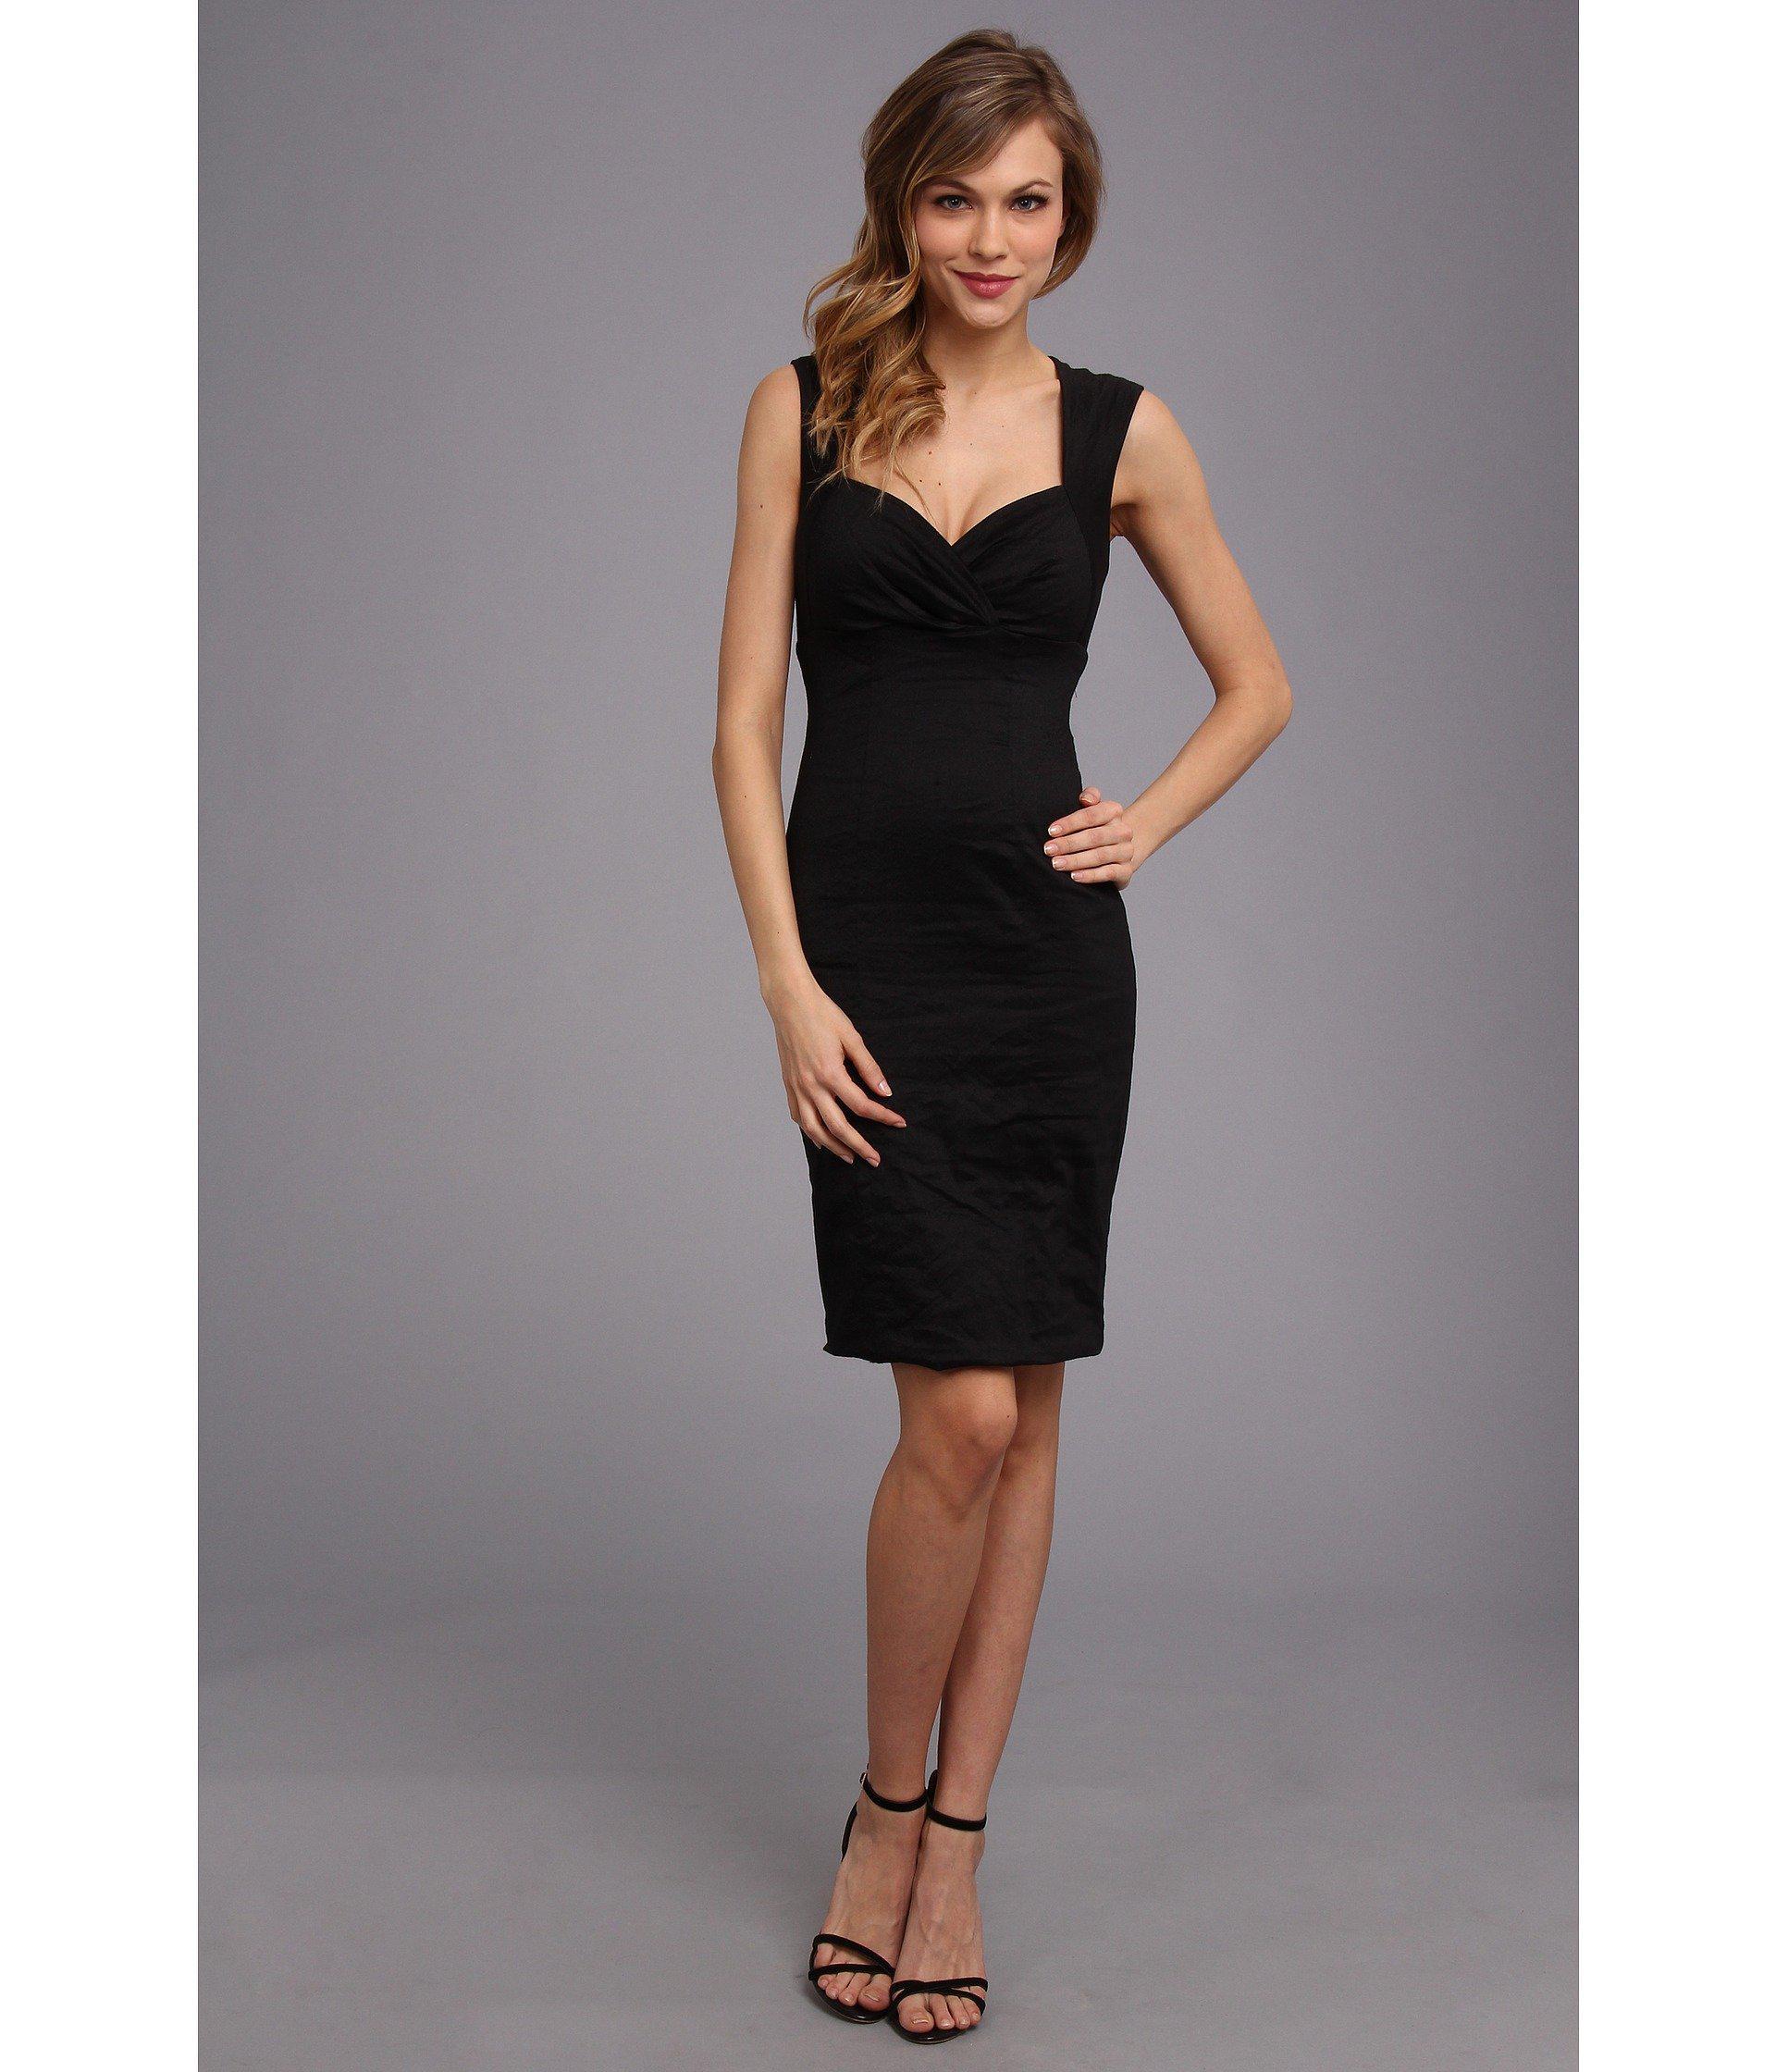 Lyst - Nicole Miller Sofia Cotton Metal Dress in Black - Save 44% e52a66413